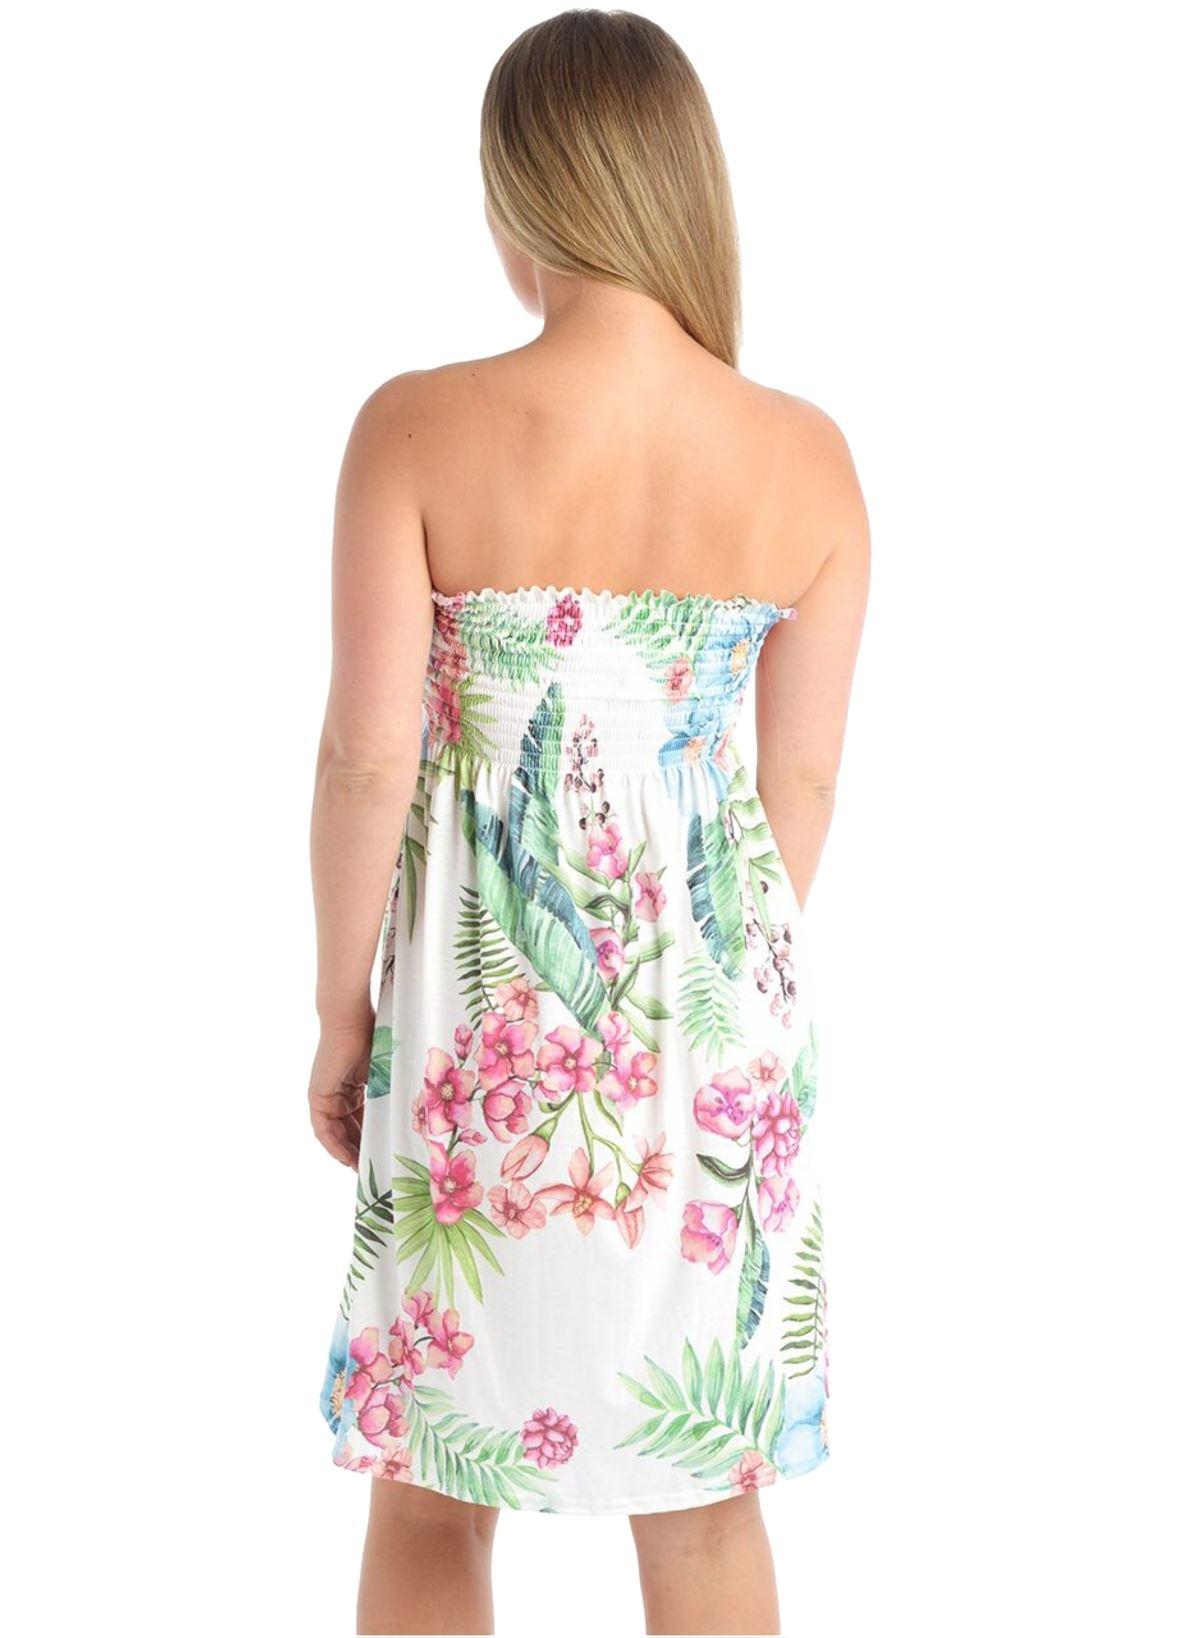 Womens Ladies Bandeau Boobtube Ruched Floral Rose Sheering Swing Mini Dress Top